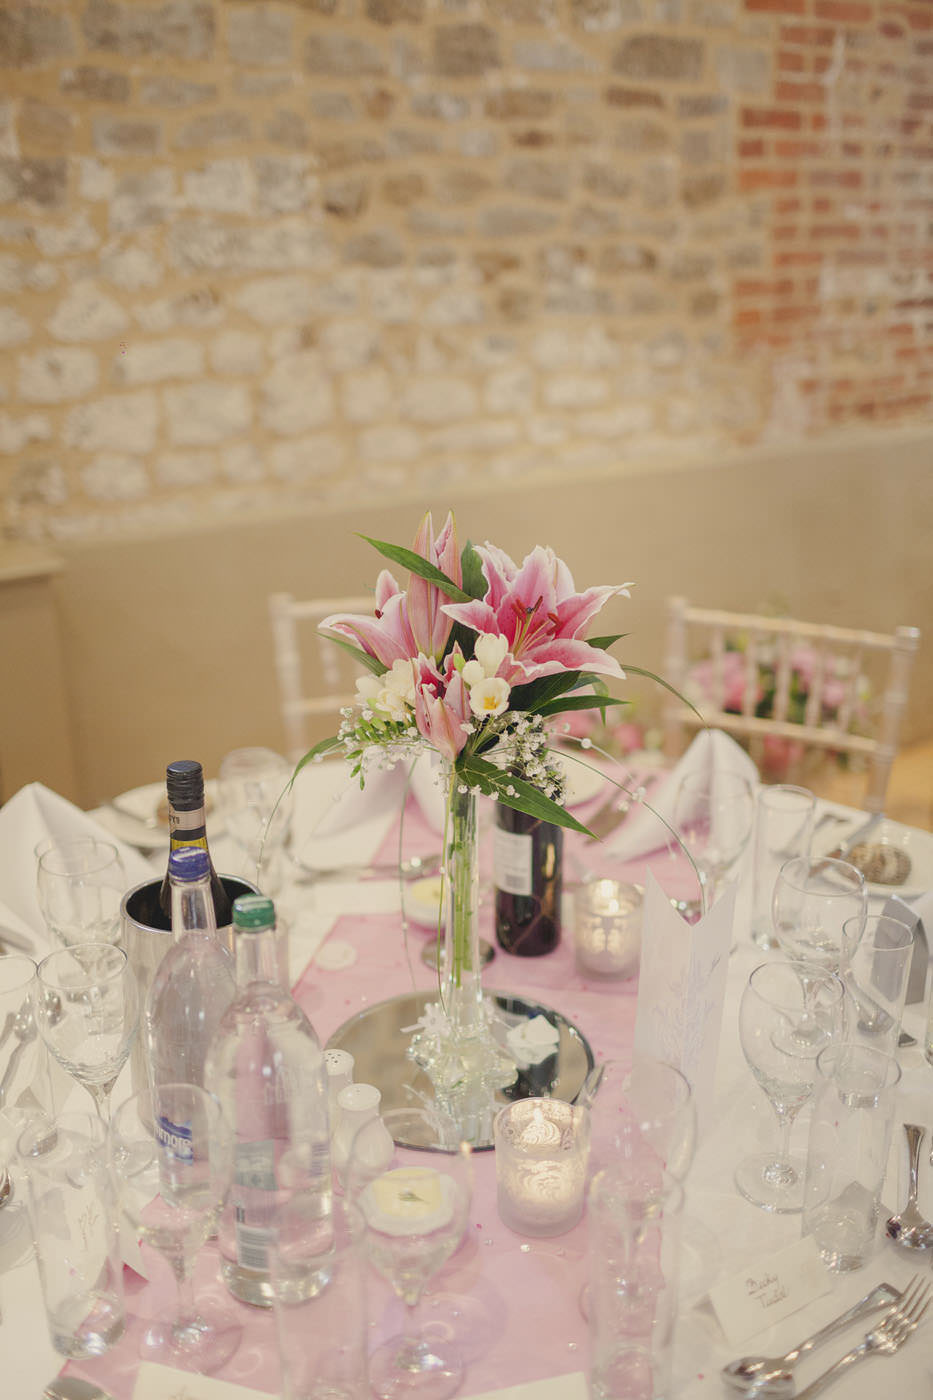 chrissarah walled garden midhurst wedding photographer 0092